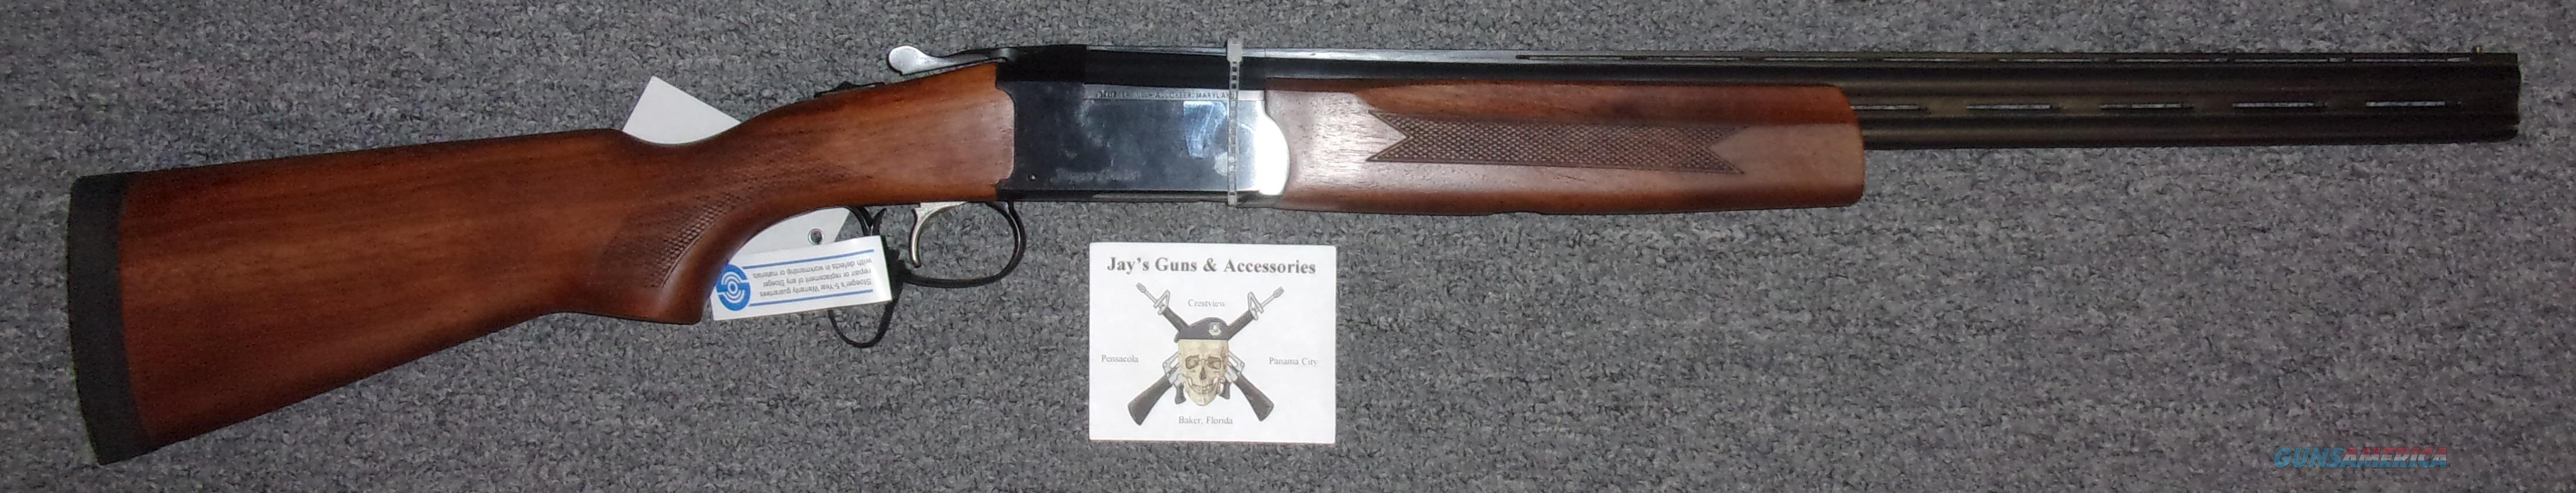 Stoeger Condor Youth (31037)  Guns > Shotguns > Stoeger Shotguns